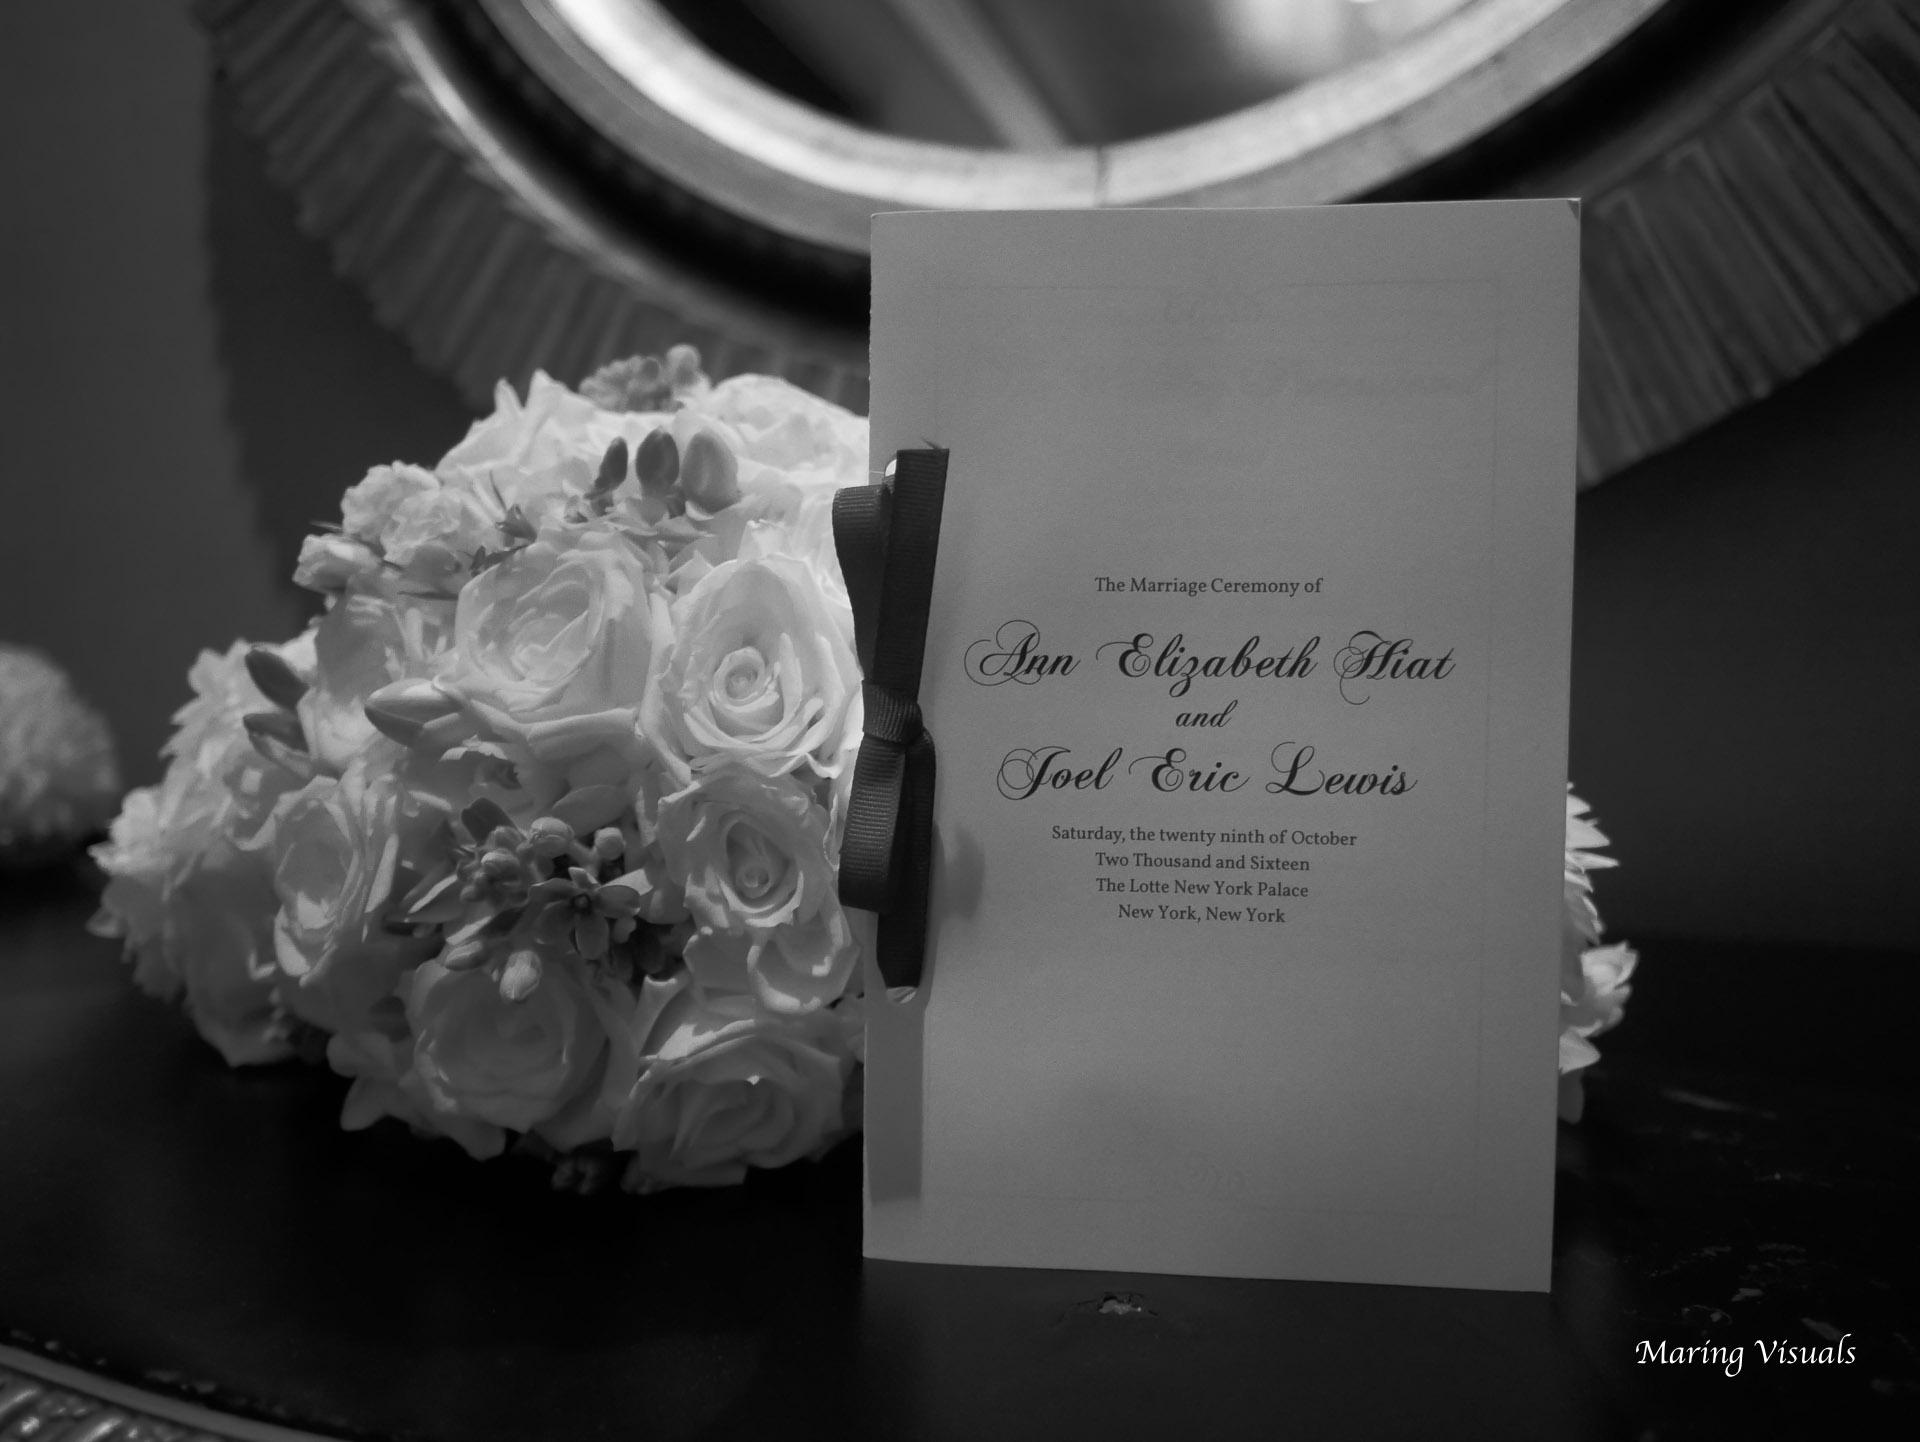 Lotte New York Palace Wedding 00234.jpg